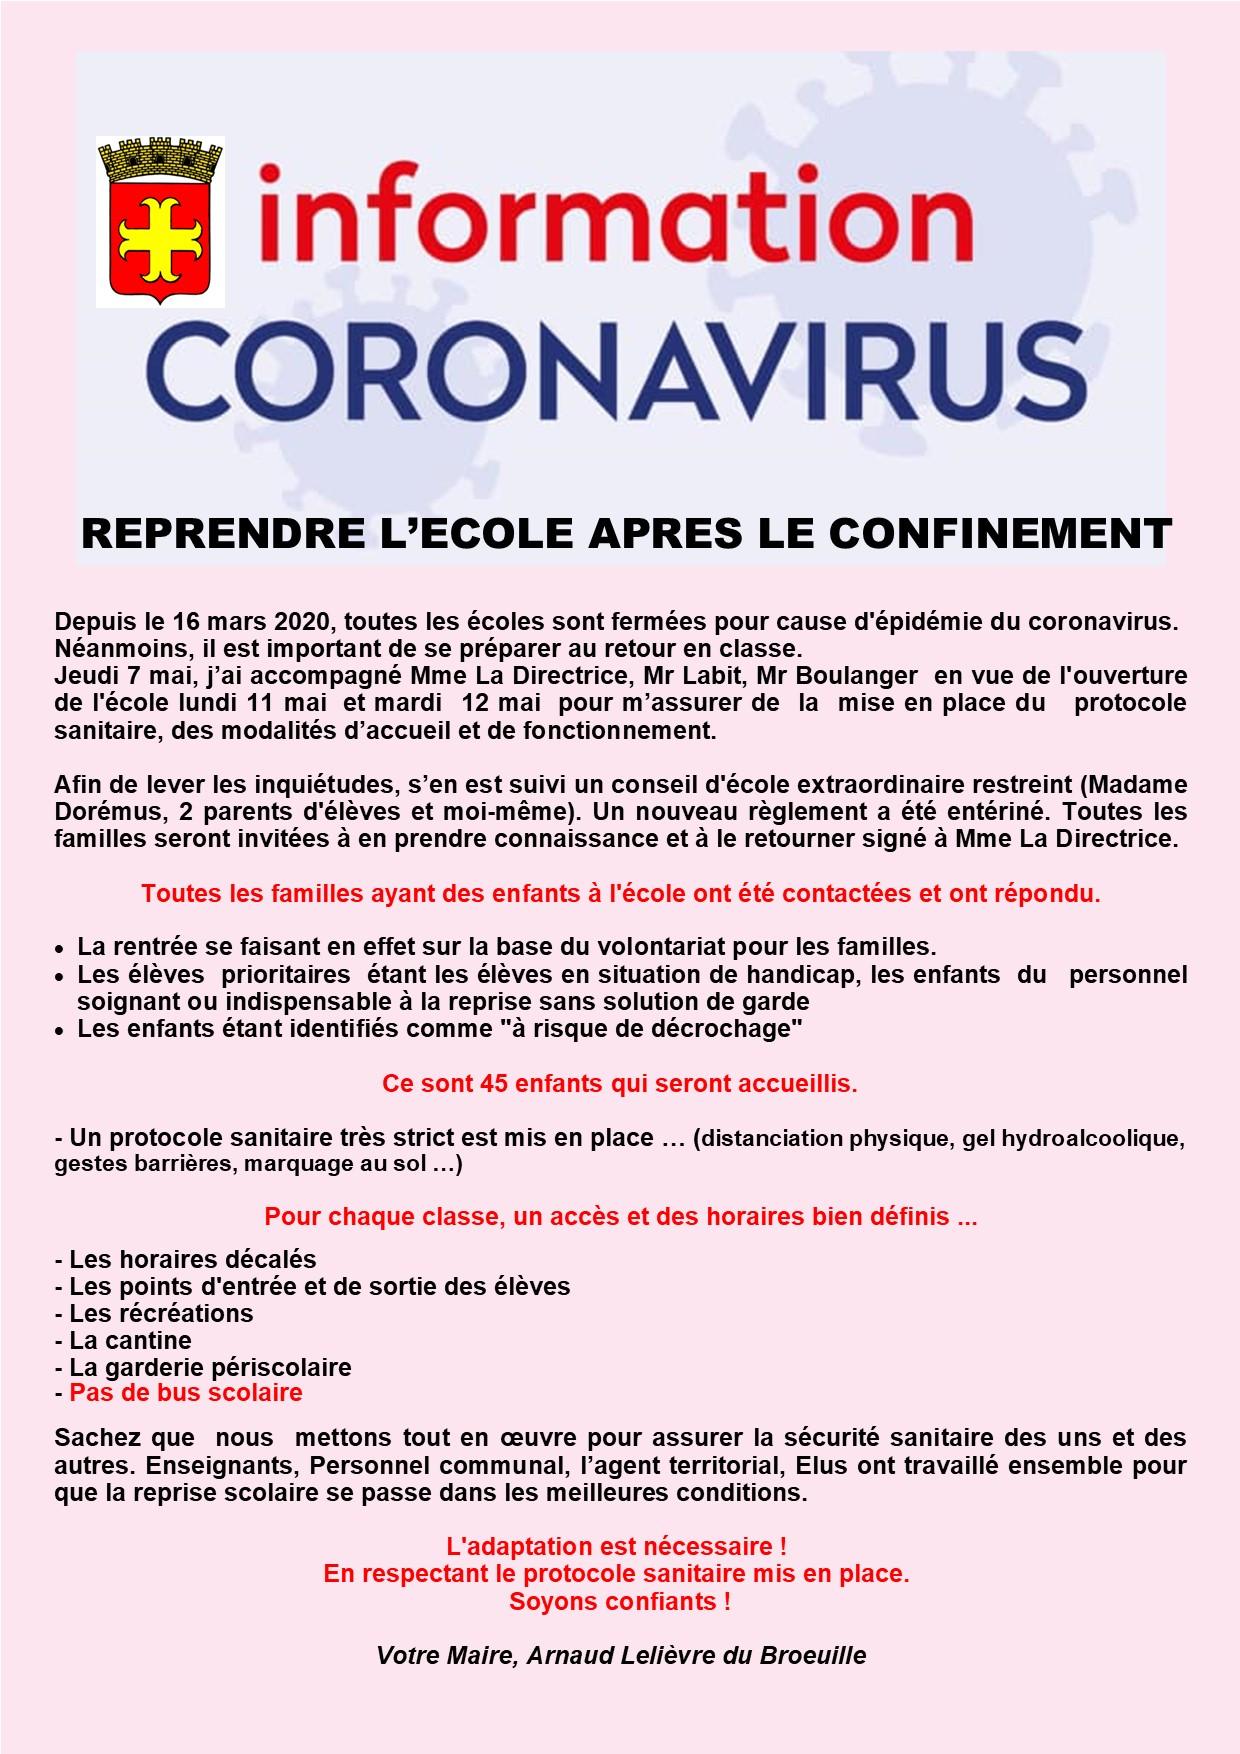 INFOS CORONAVIRUS  REPRISE ECOLE 08052020.jpg